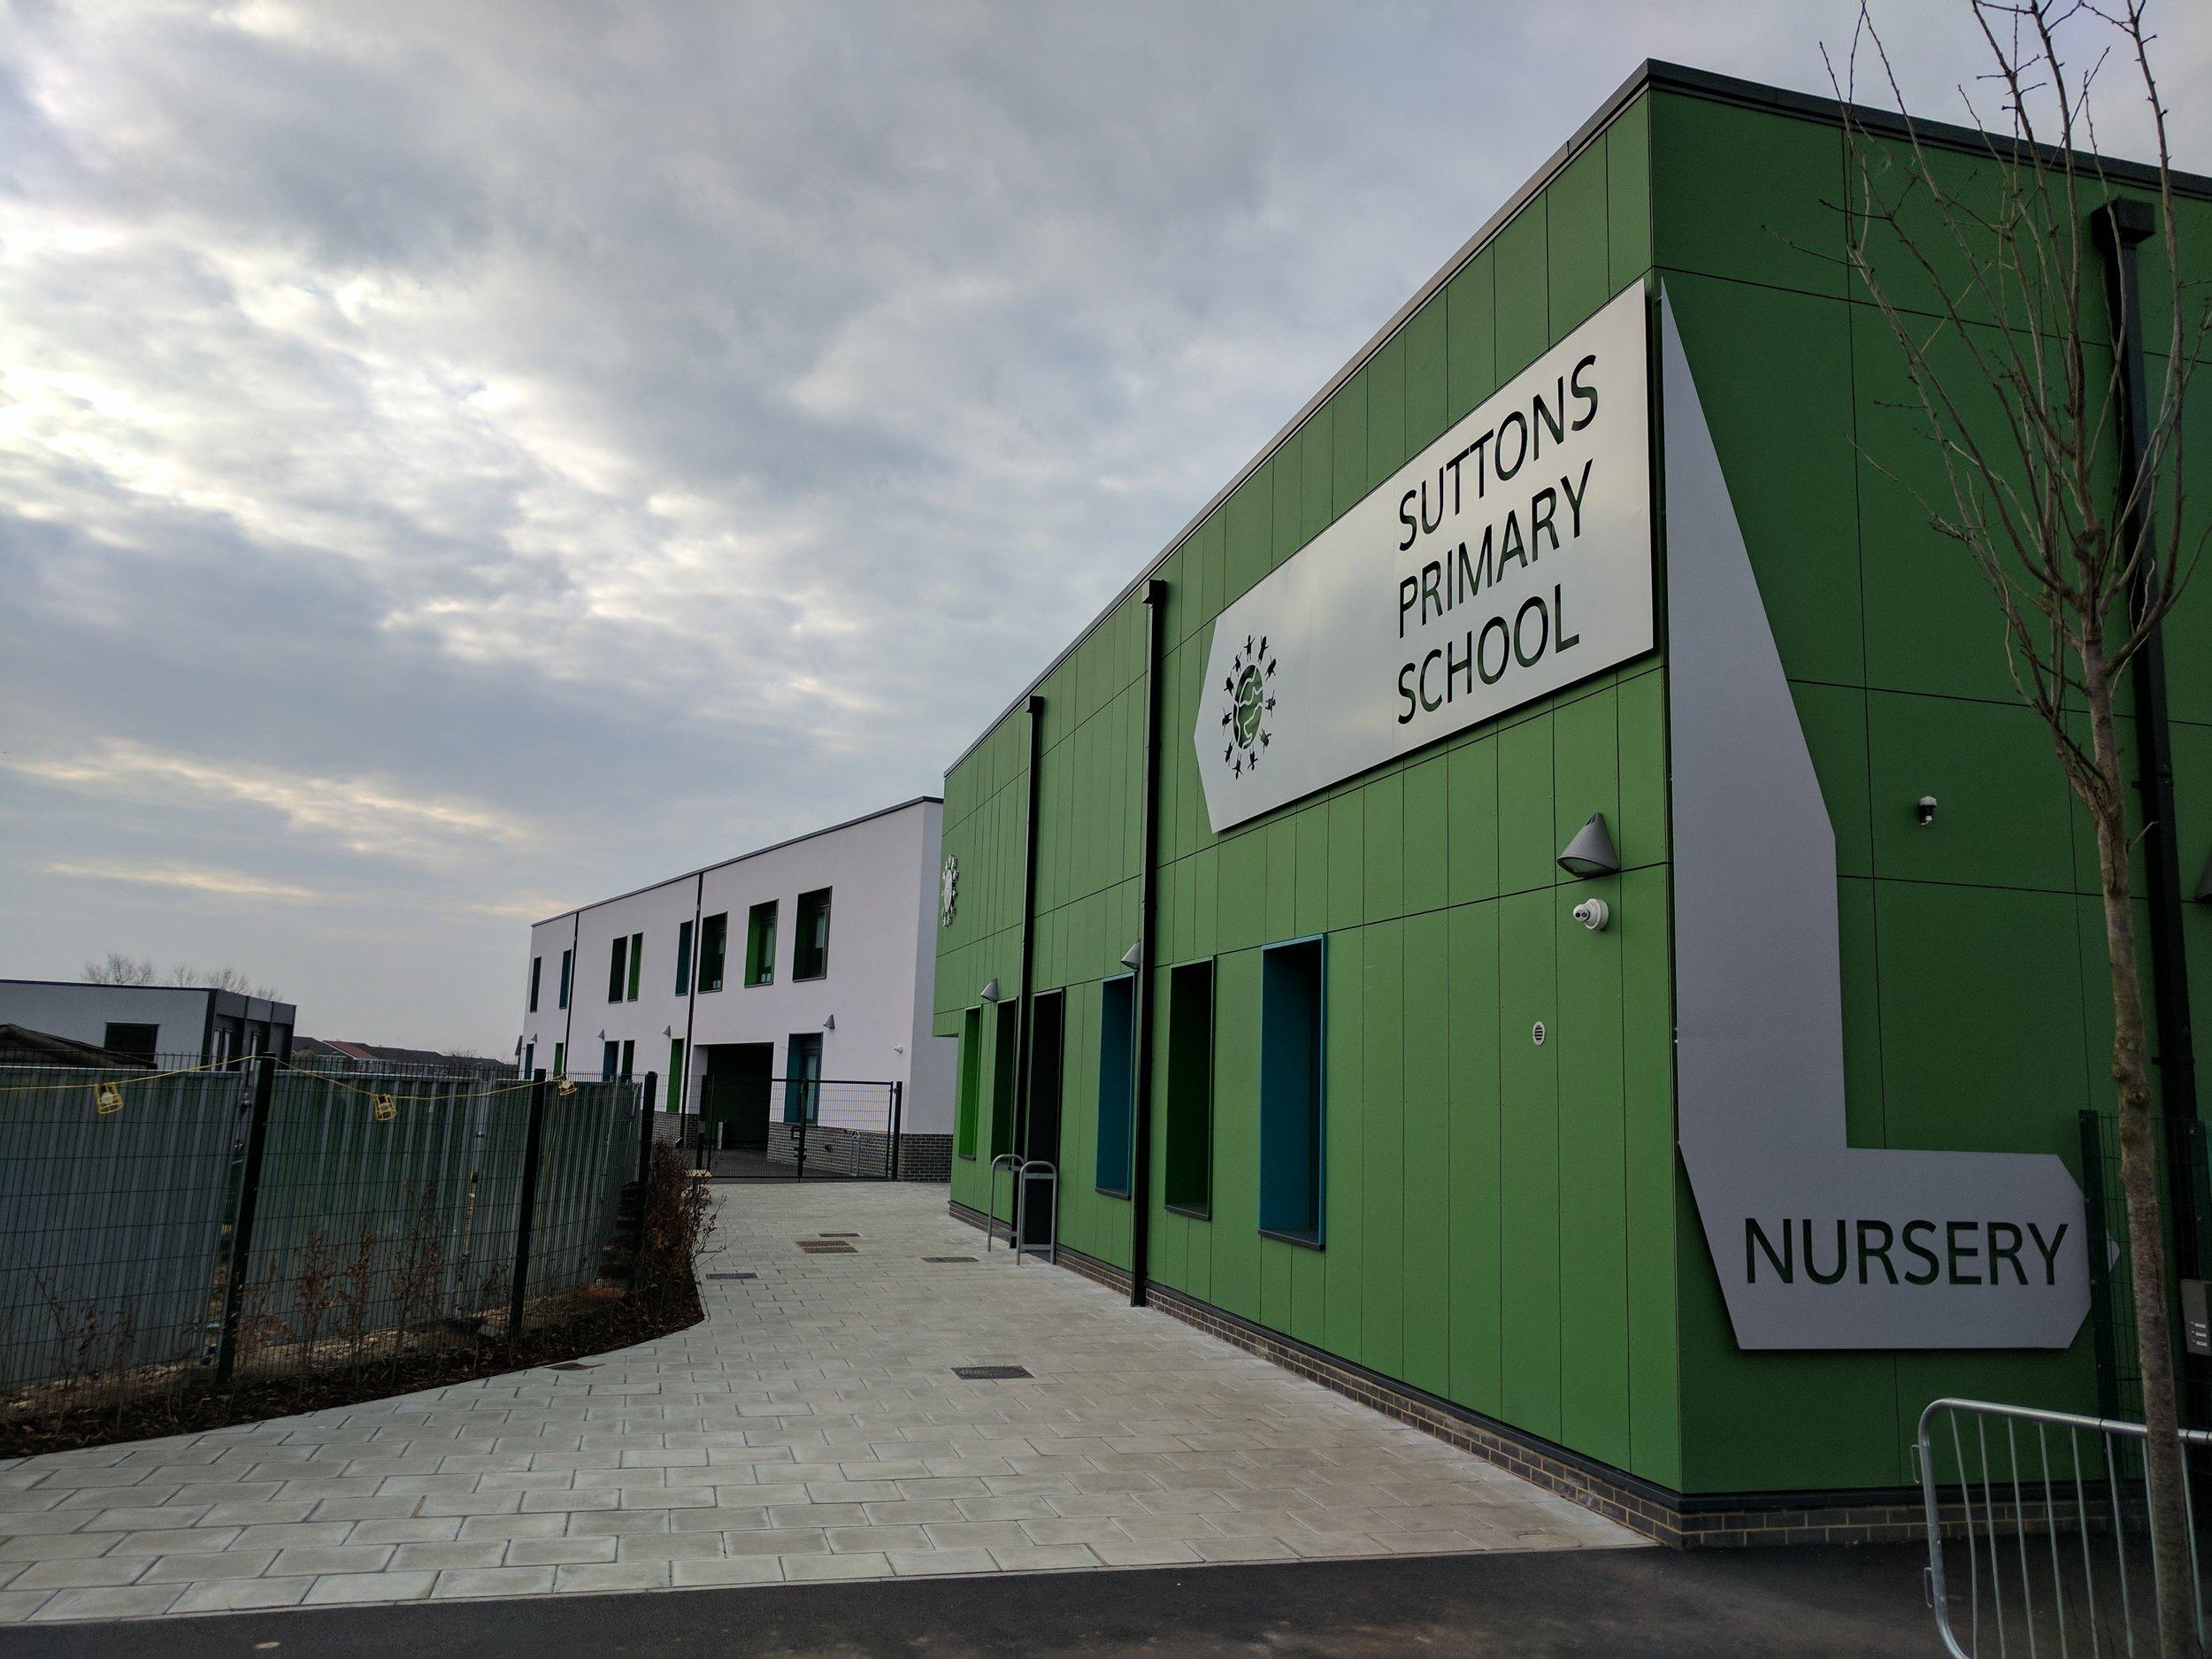 Suttons Primary School